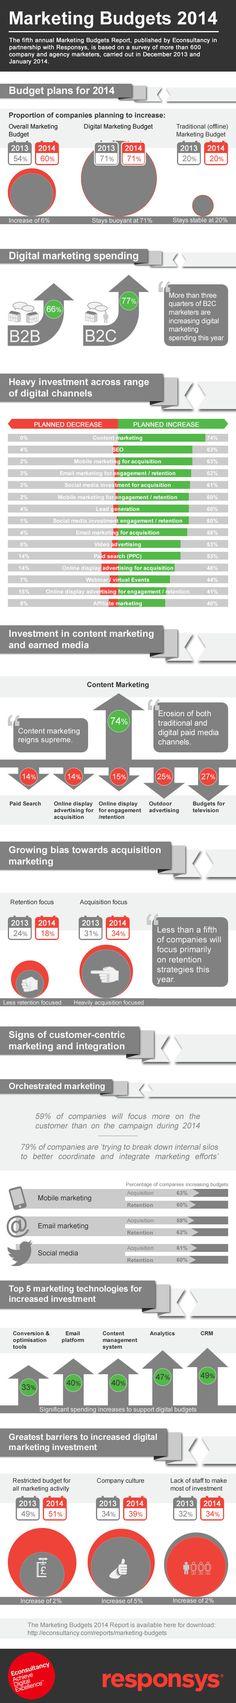 60% of businesses plan to increase marketing budgets in 2014 #infographic #infografía #albertobokos